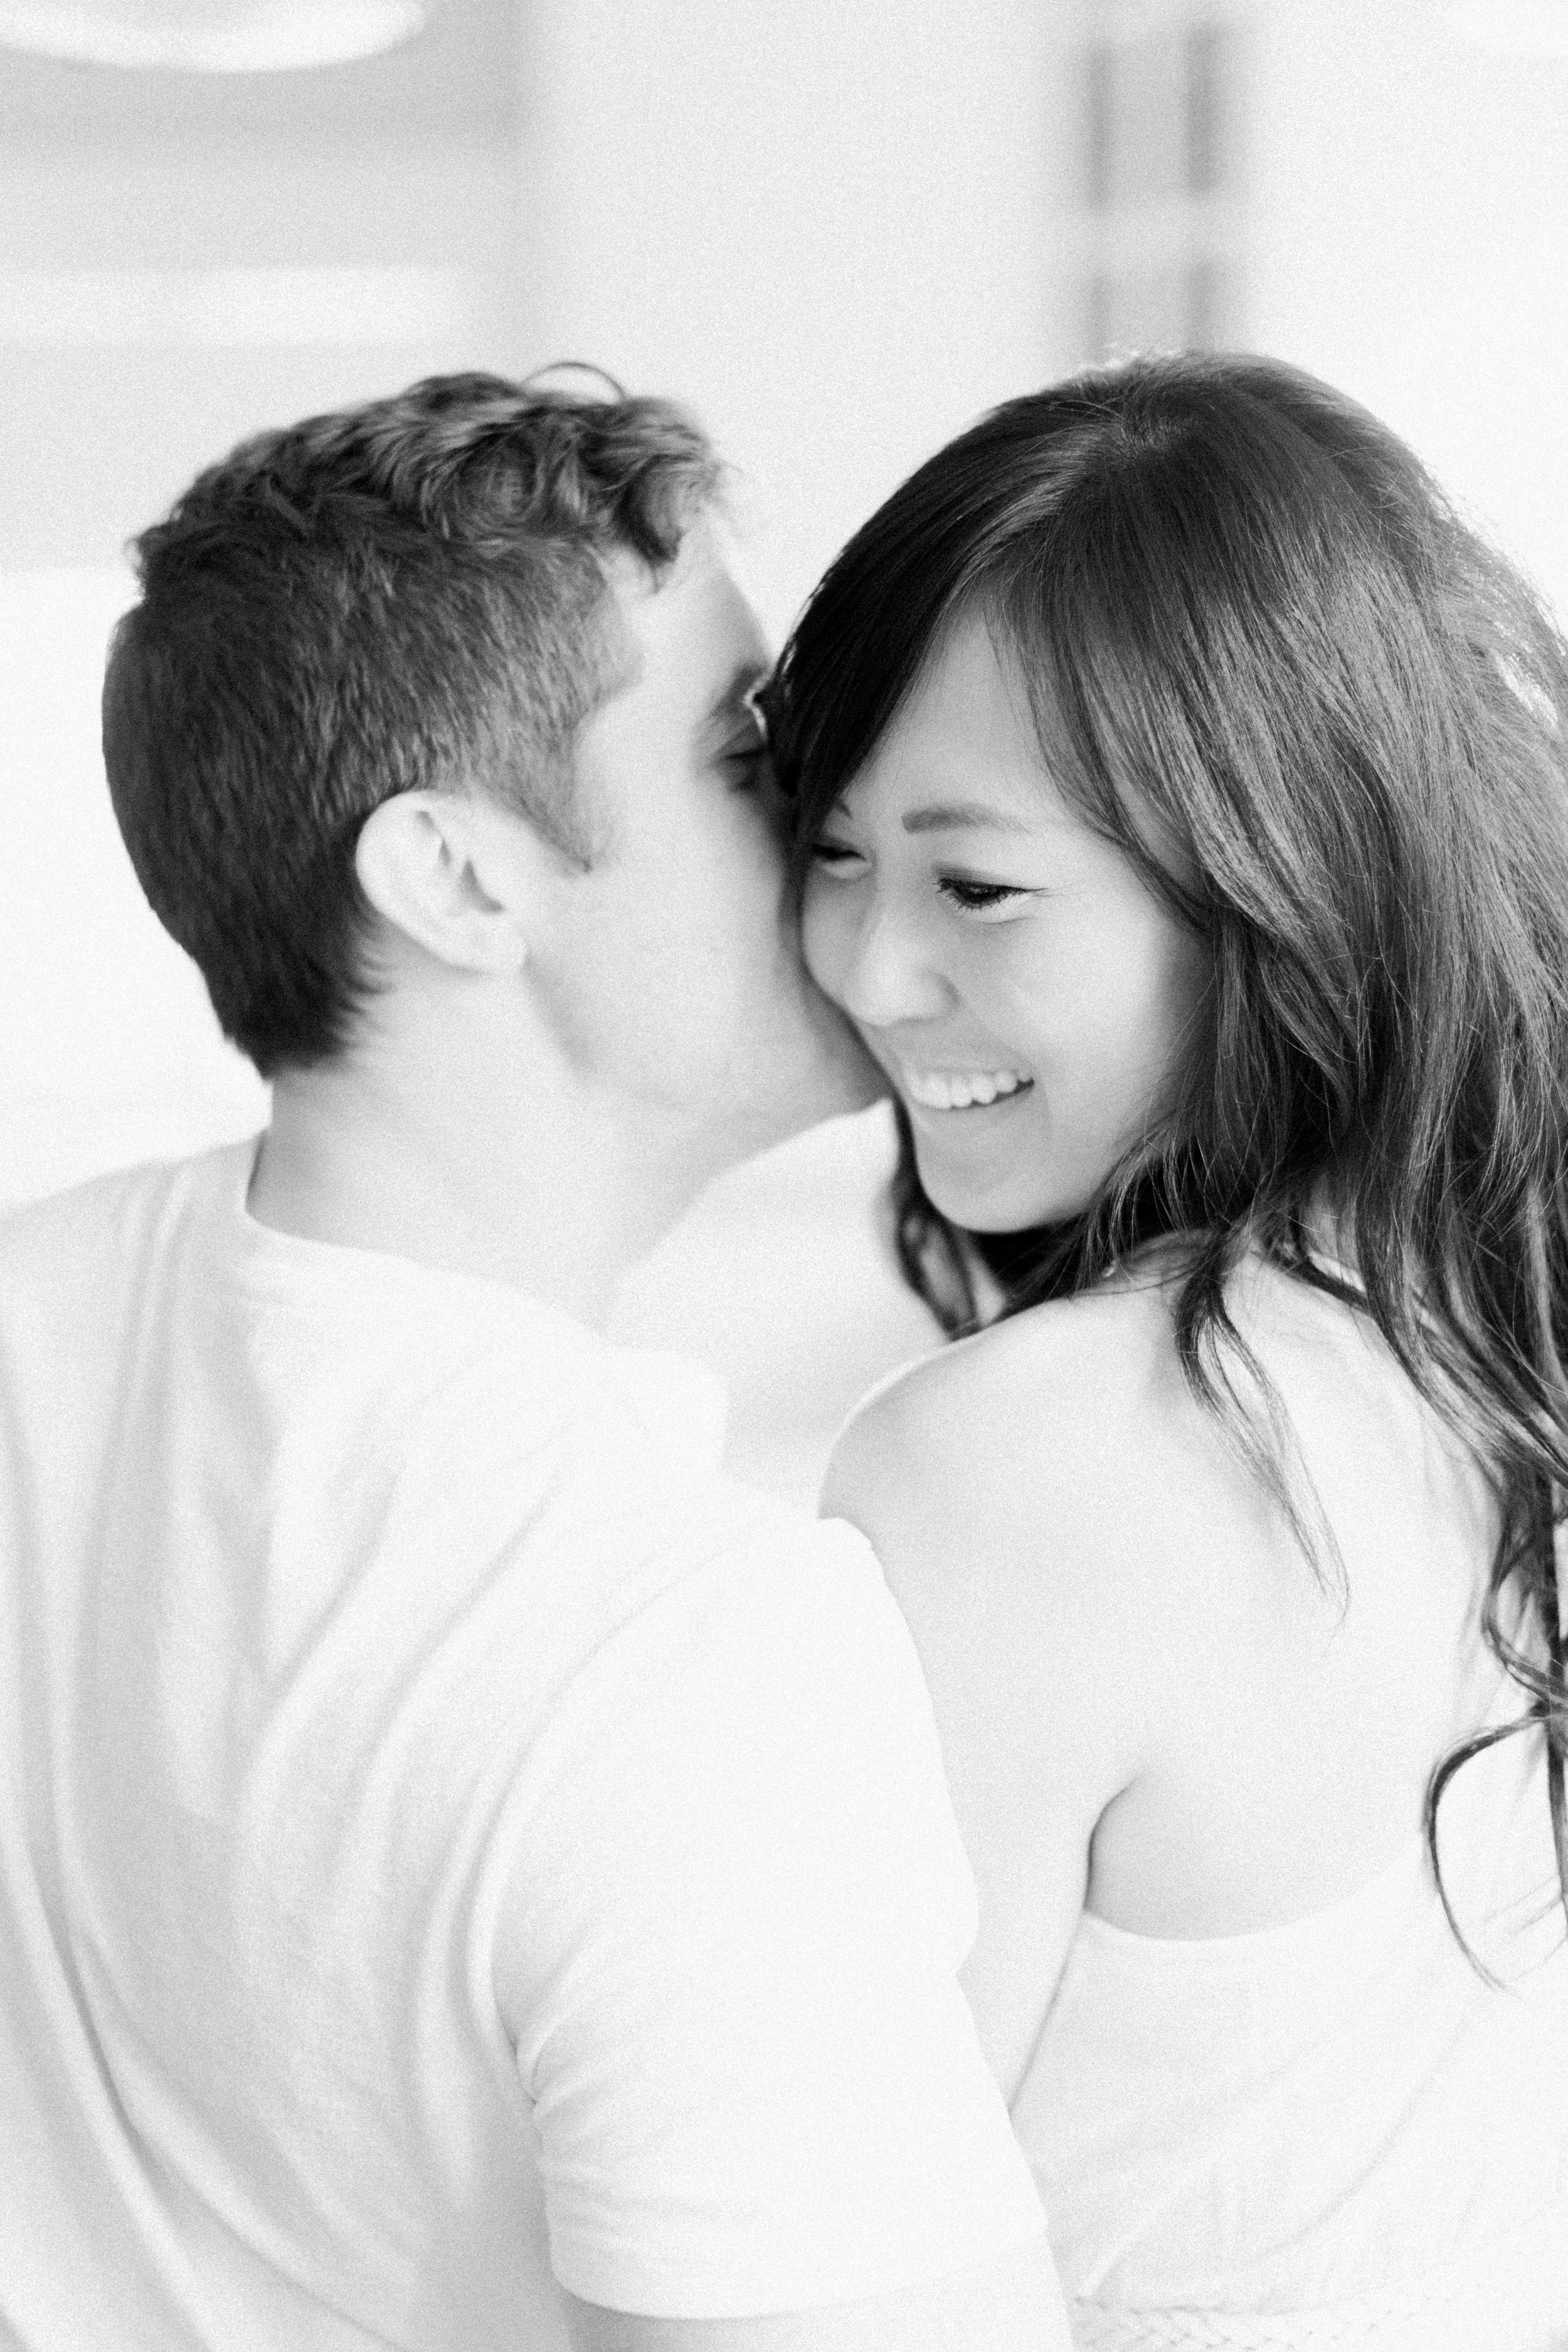 Cari Zhu Photography - Toronto Engagement At Home Kitchen Lifestyle Session-5368-2.jpg